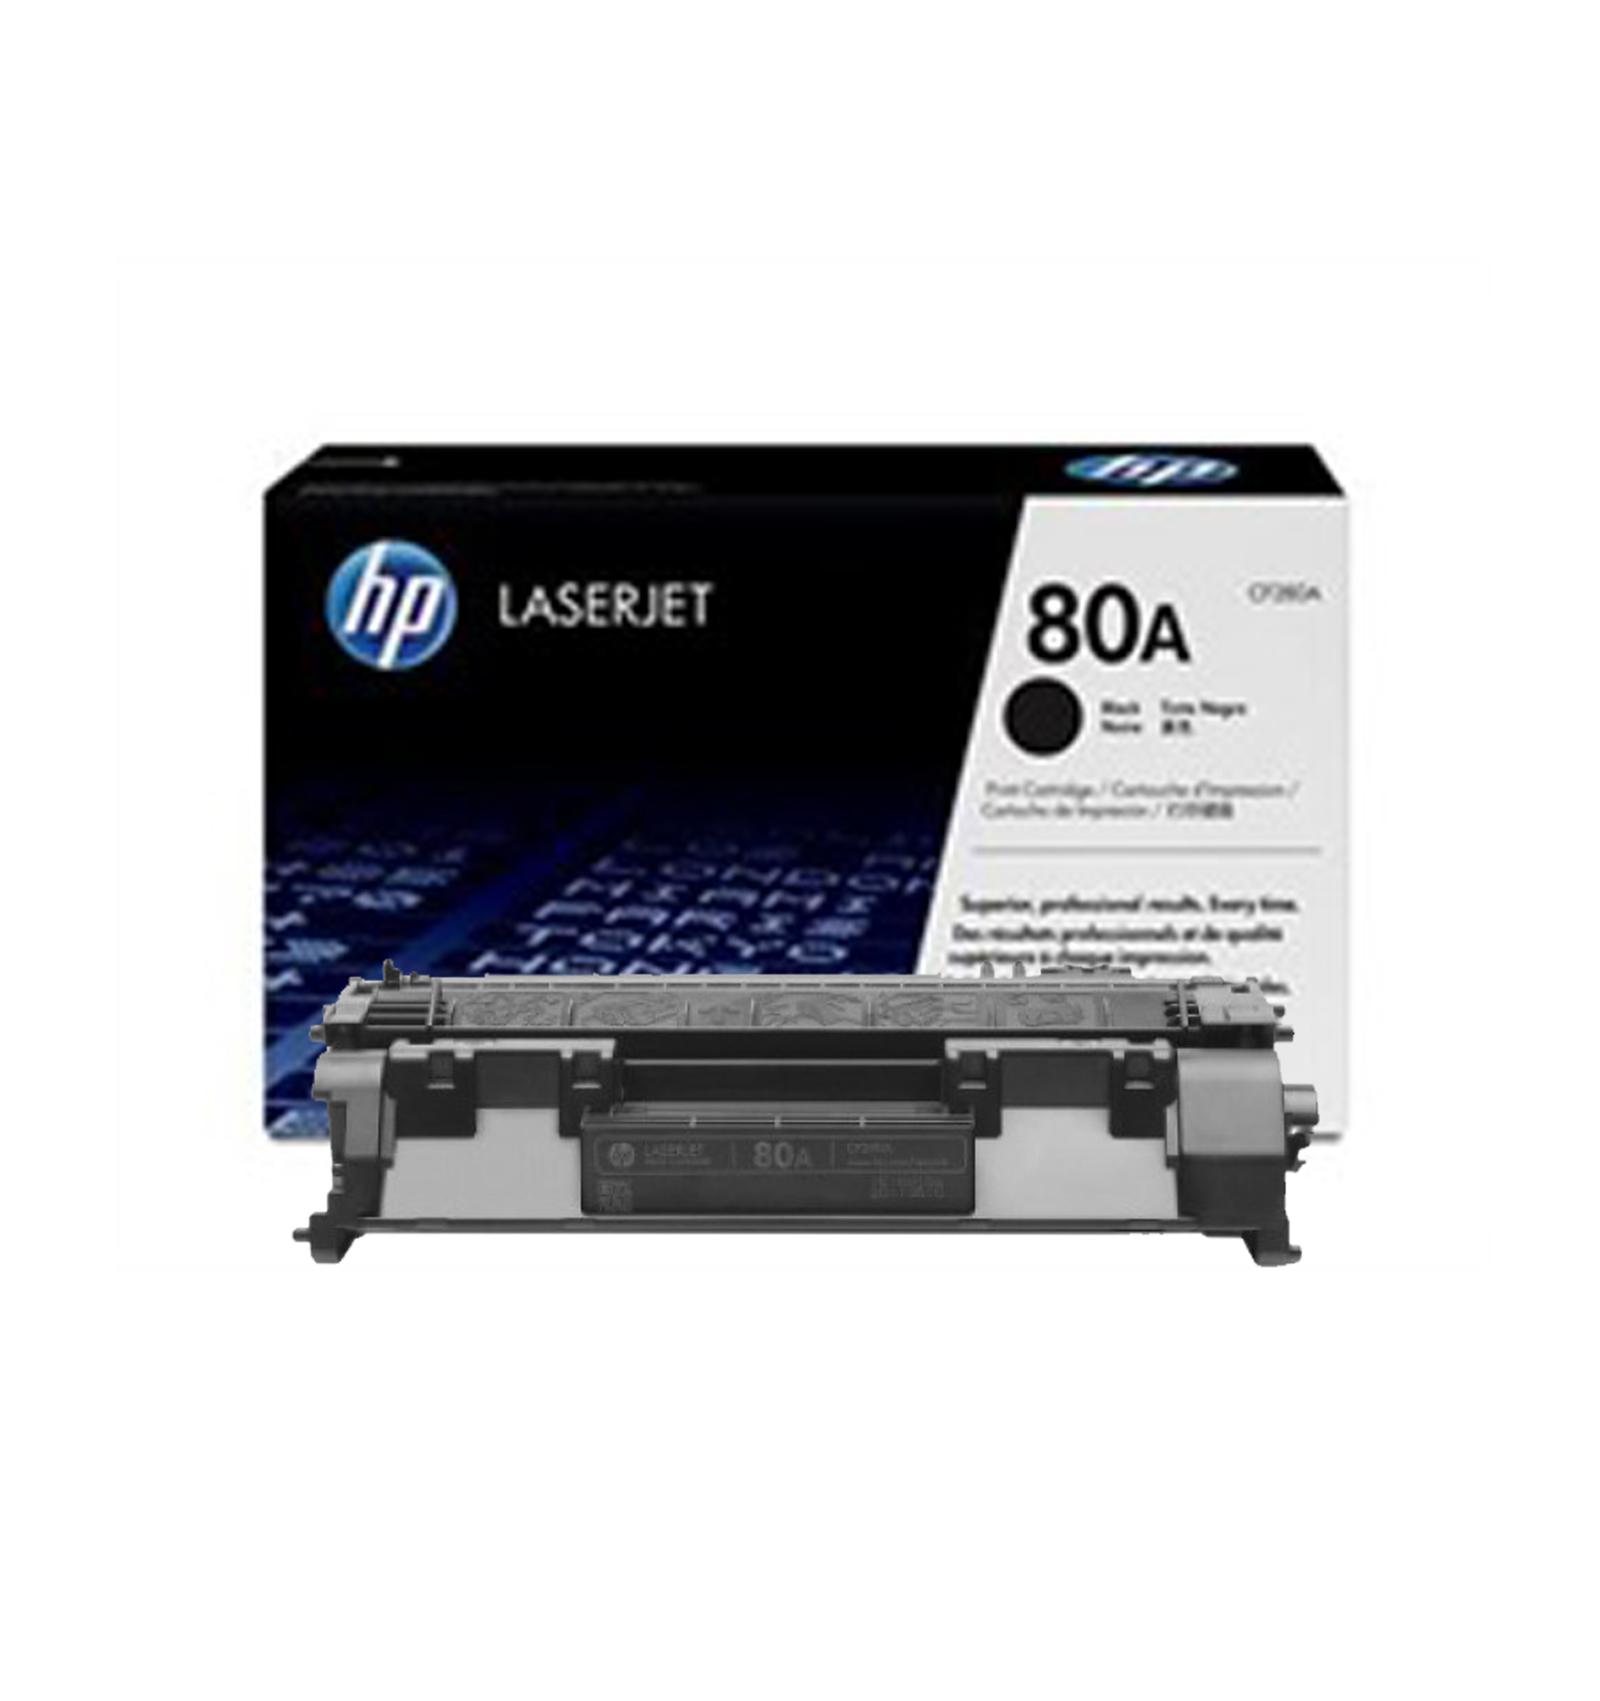 HP CF280A (80A) для LaserJet Pro 400 M401a/M401d/M401dn/M401dw/M425